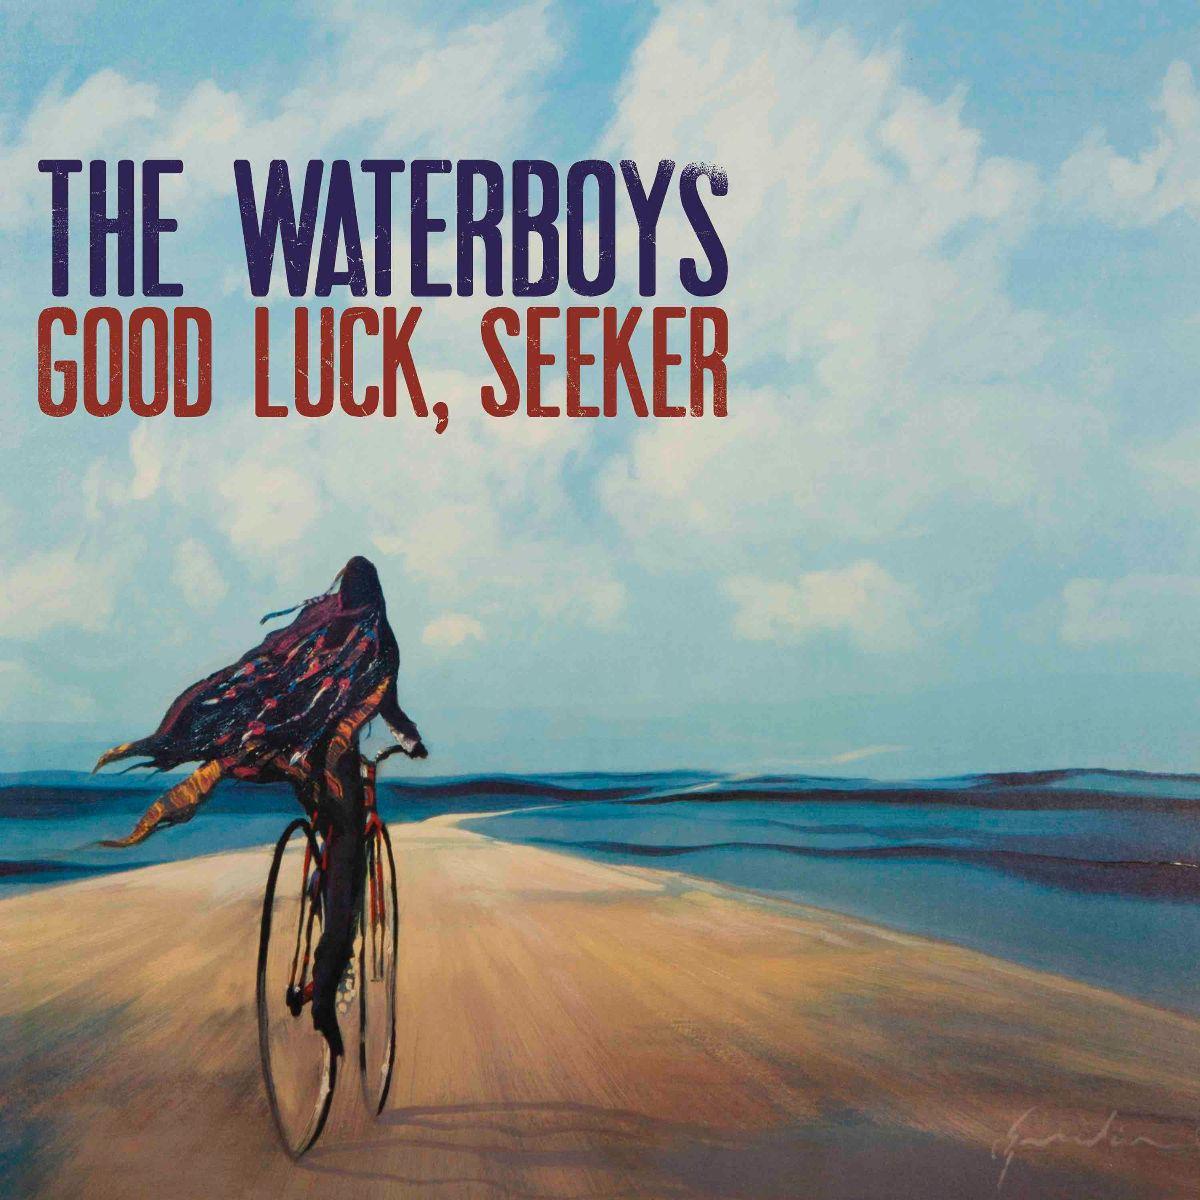 The Waterboys - Good Luck, Seeker [LP]